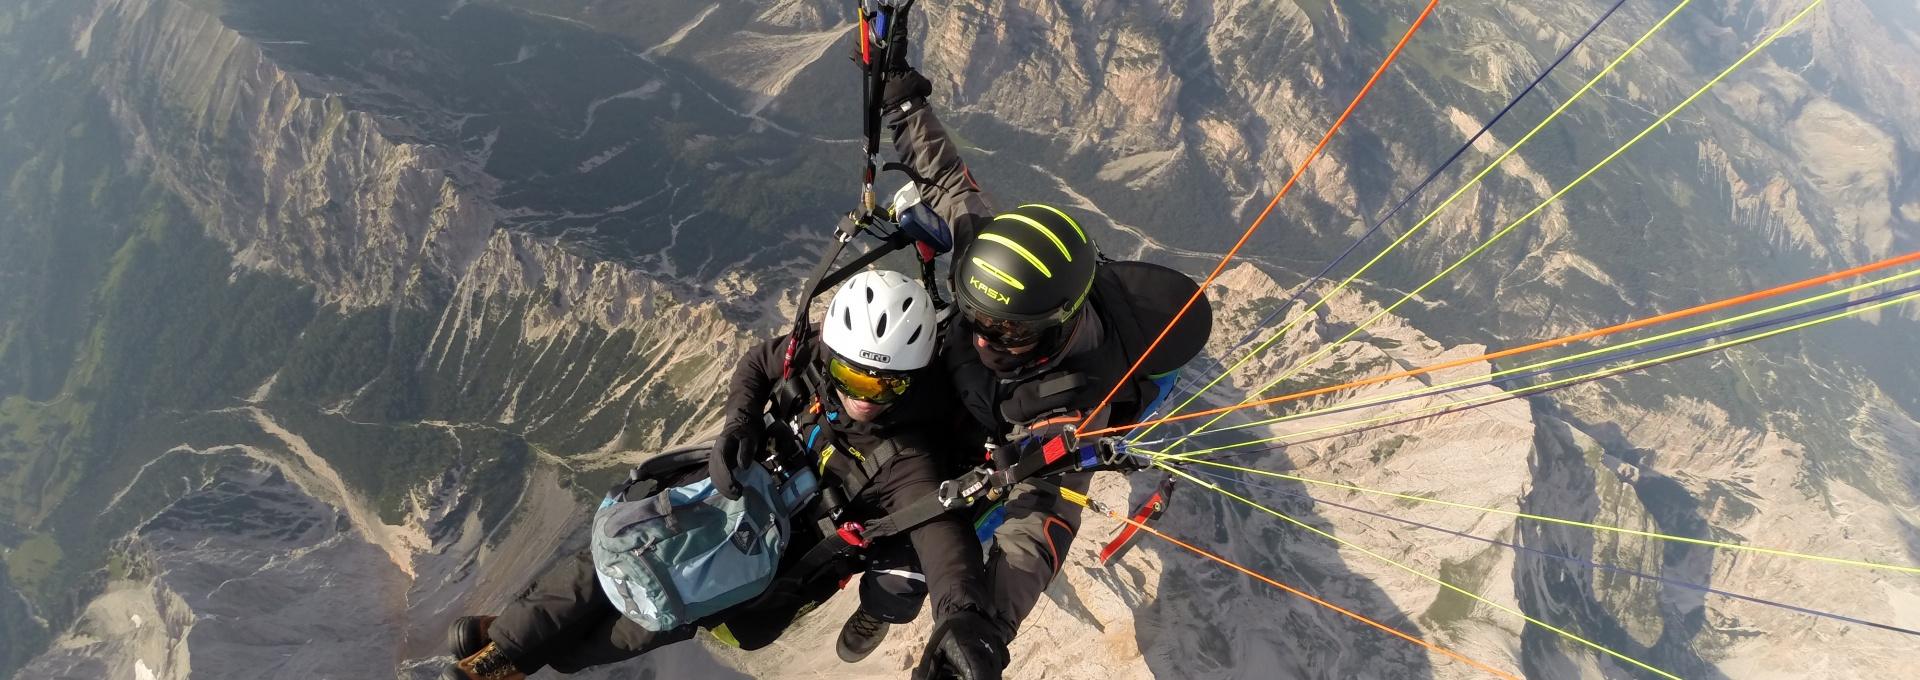 Alta Badia - Val Badia Paragliding